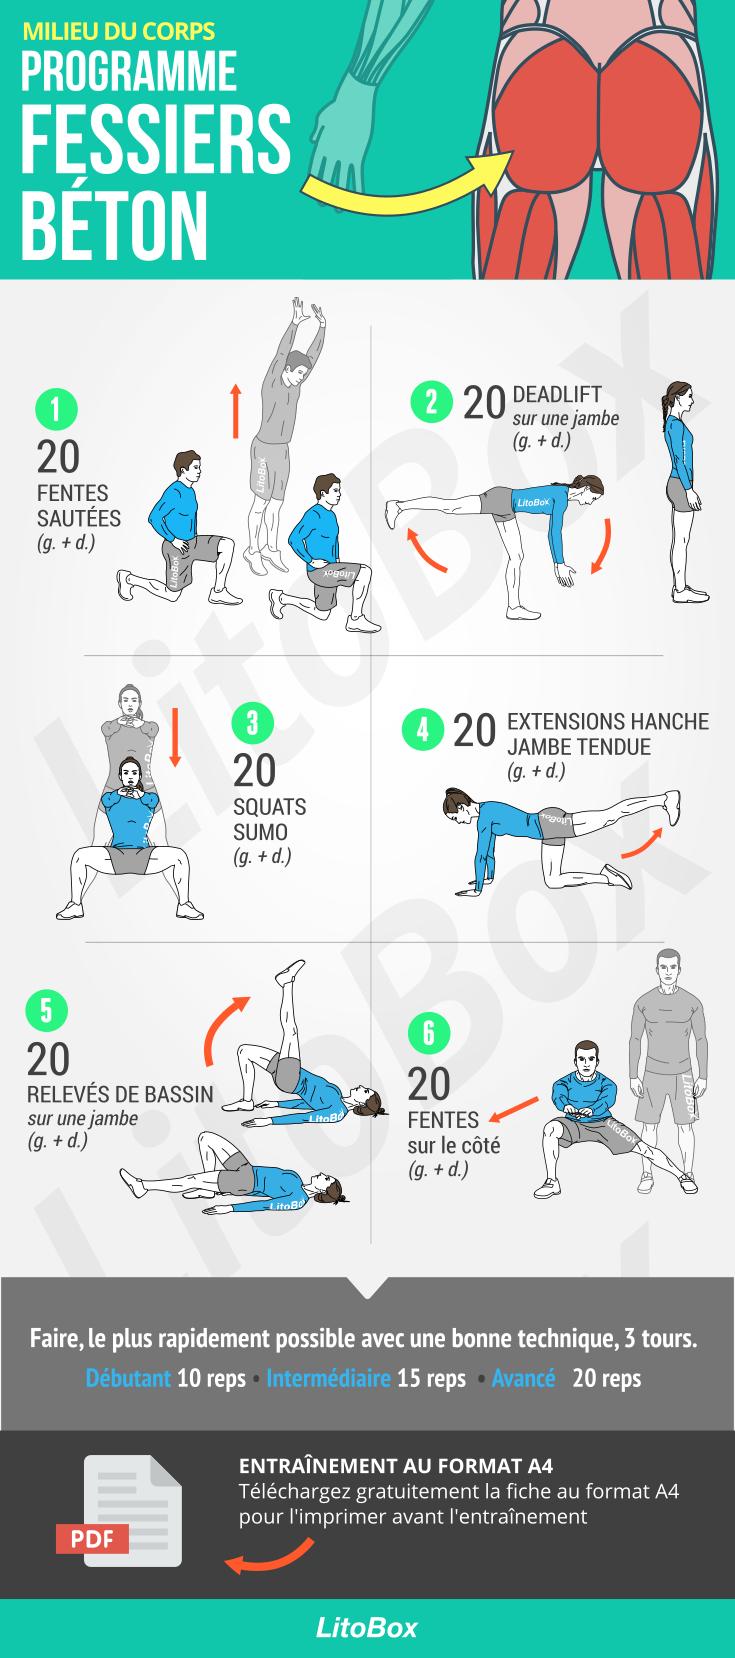 Exercice Muscler Les Fessiers Homme Comparateur Muscler Ses Fessiers